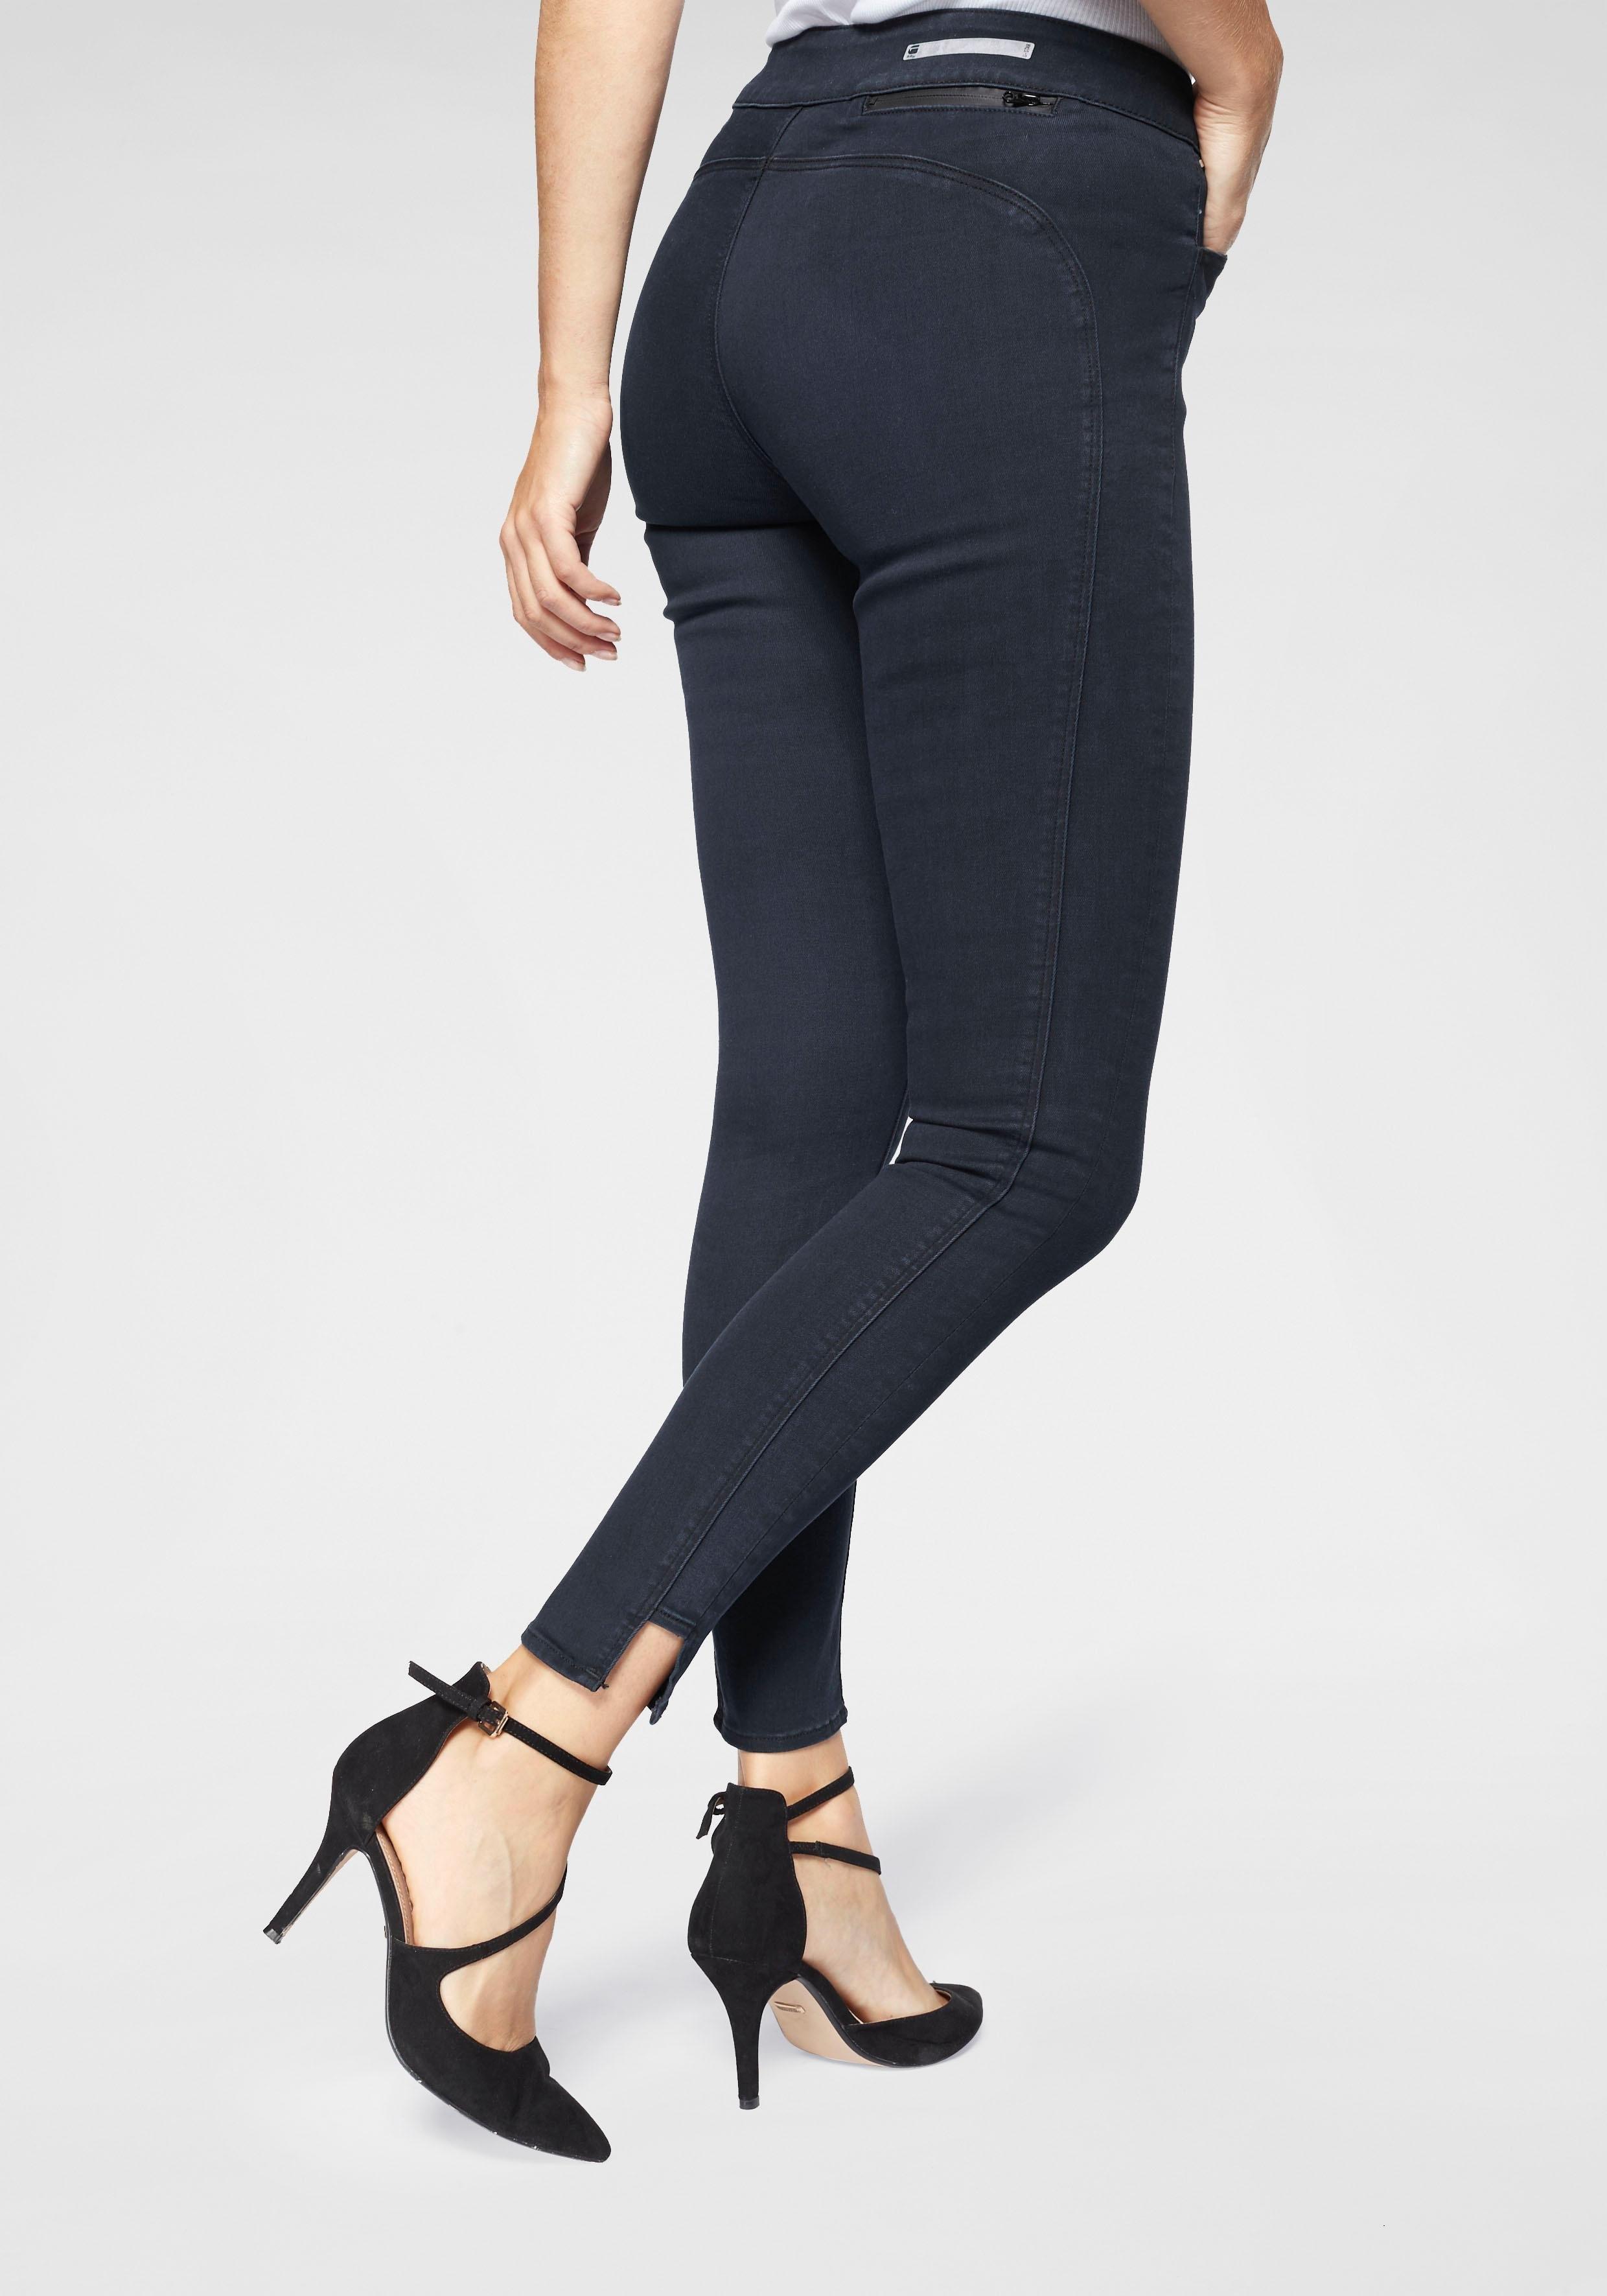 G-star Raw skinny fit jeans »Citishield High Jegging Ankle WMN, Superskinny« nu online bestellen